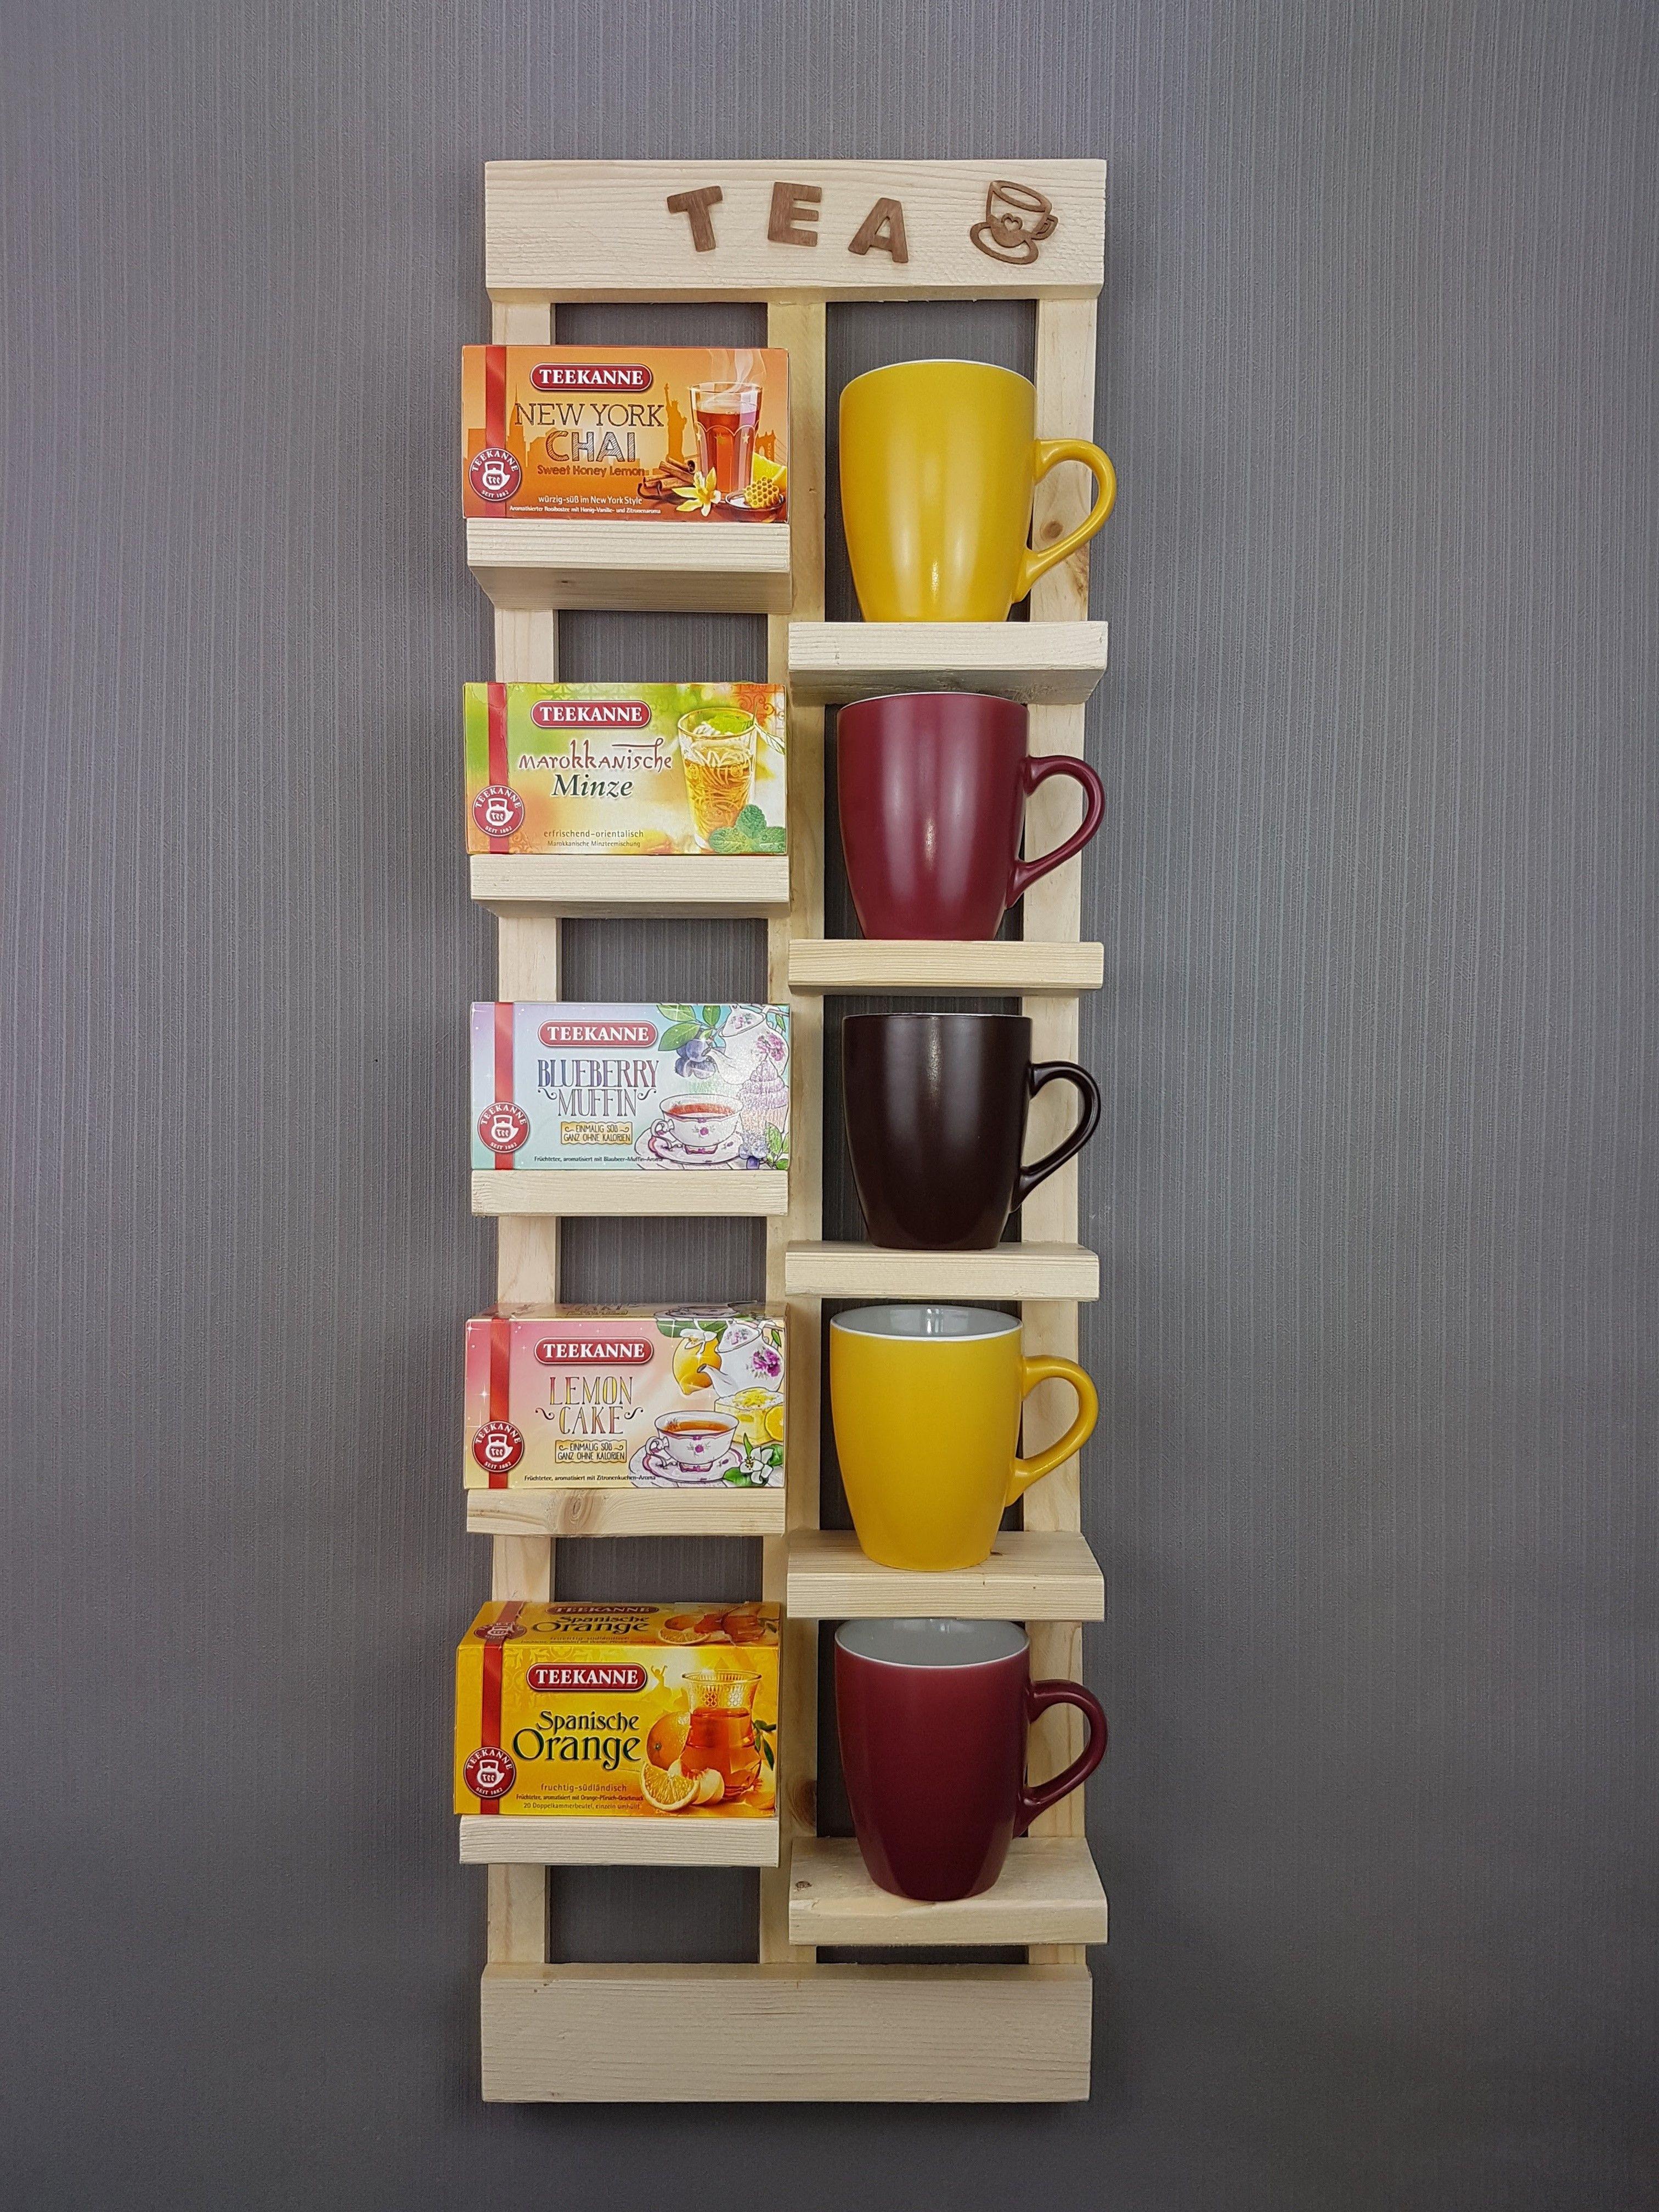 Tee Aufbewahrung Diy  Tee Regal Upcycling Einzigartiges Tee Regal welches du